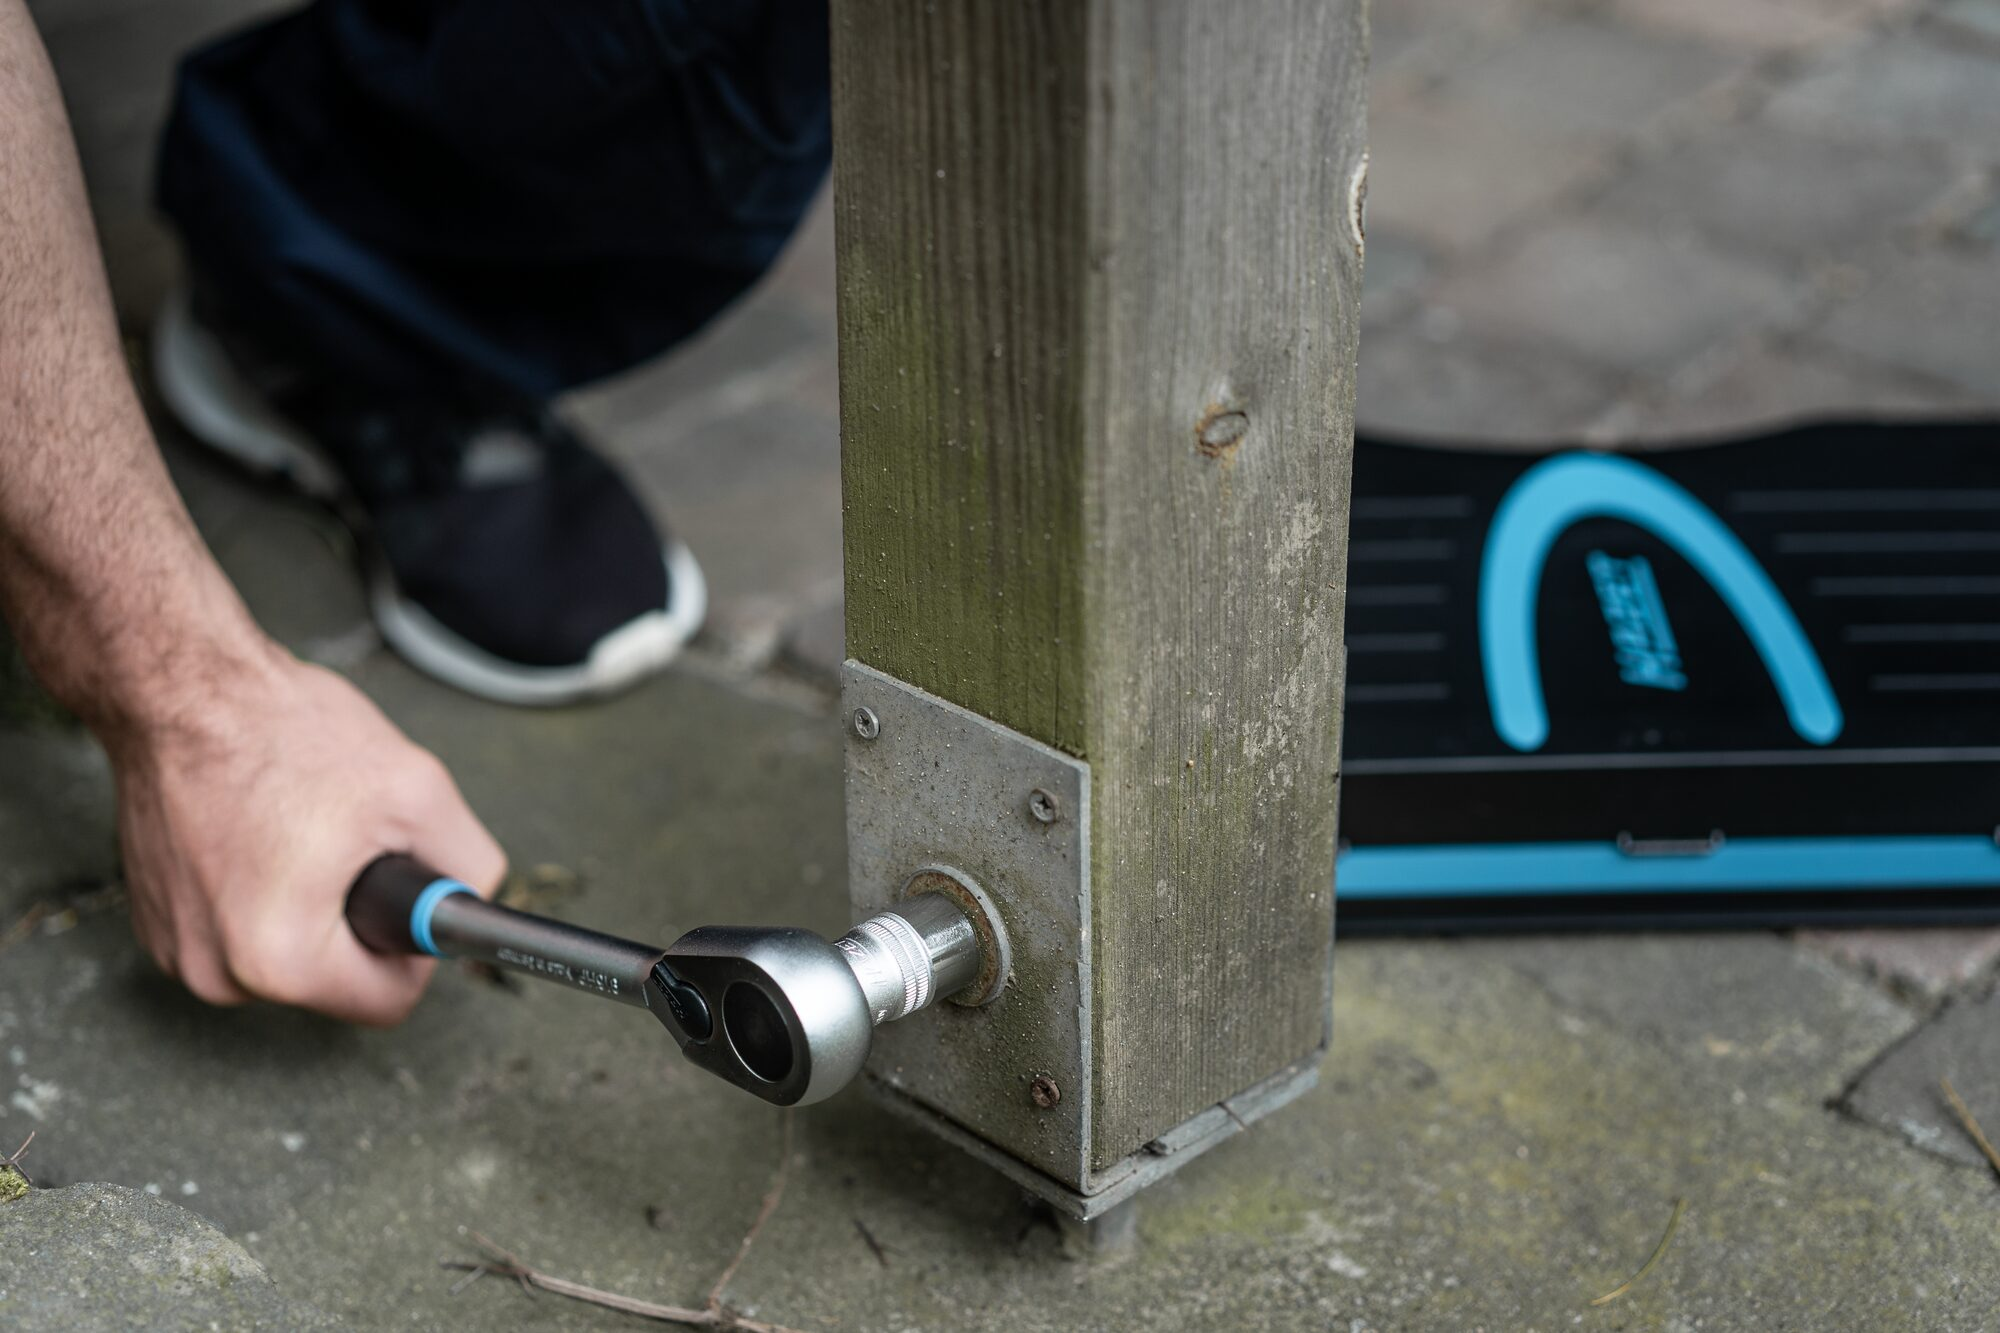 HAZET Steckschlüssel Satz 953HP ∙ Vierkant hohl 12,5 mm (1/2 Zoll) ∙ Anzahl Werkzeuge: 47